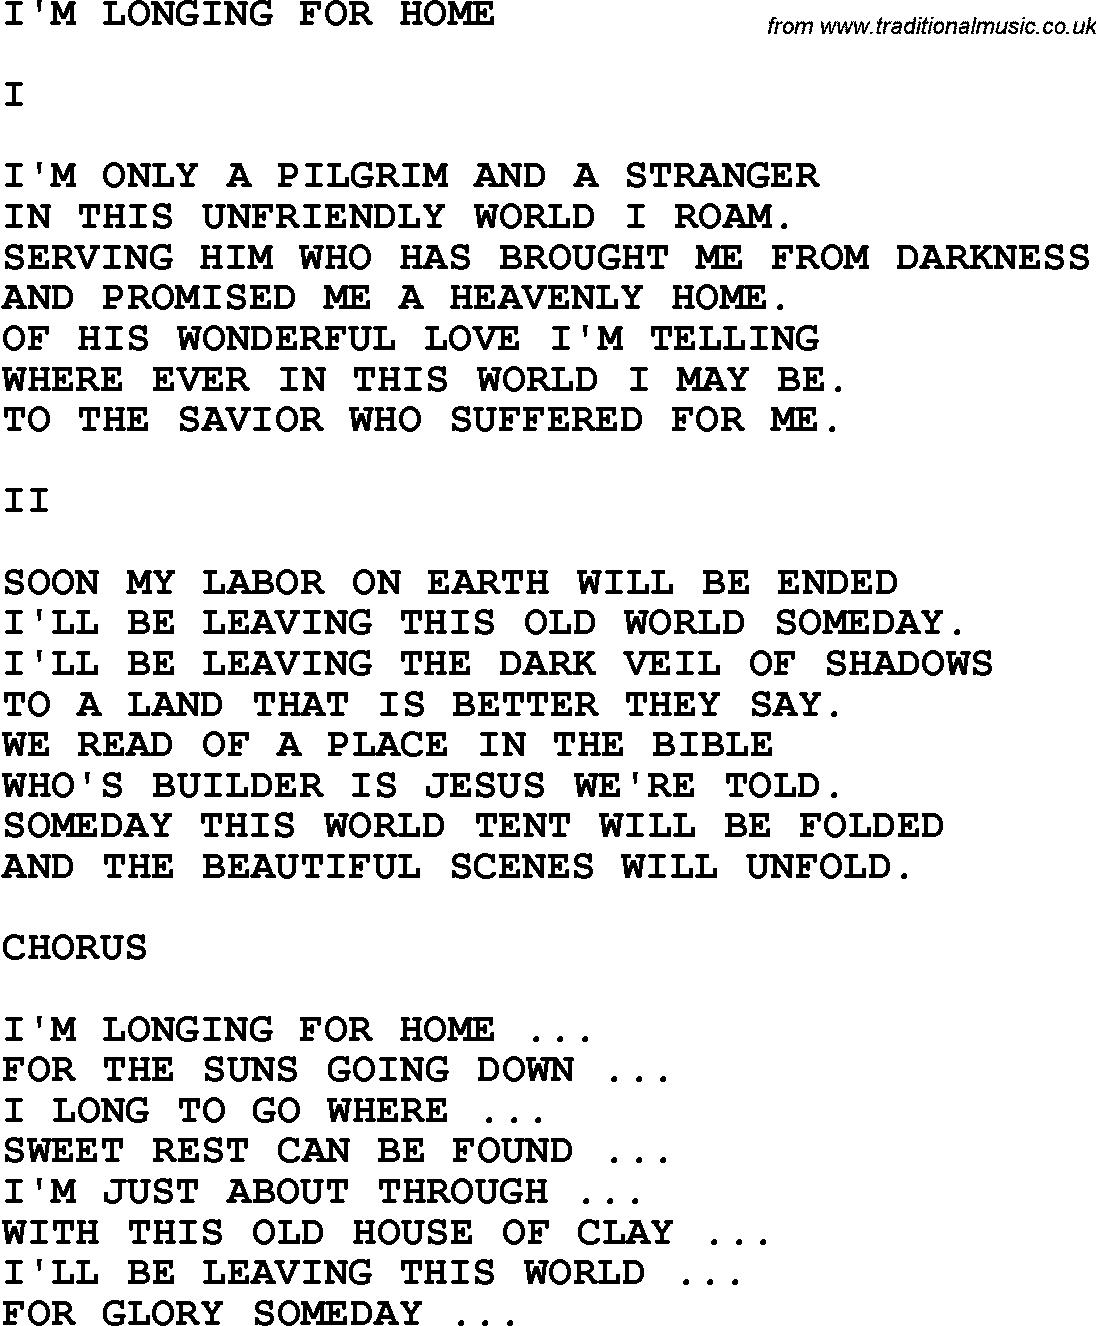 Gospel Song I'm Longing For Home Lyrics | Music Lyrics | Pinterest - Free Printable Gospel Music Lyrics